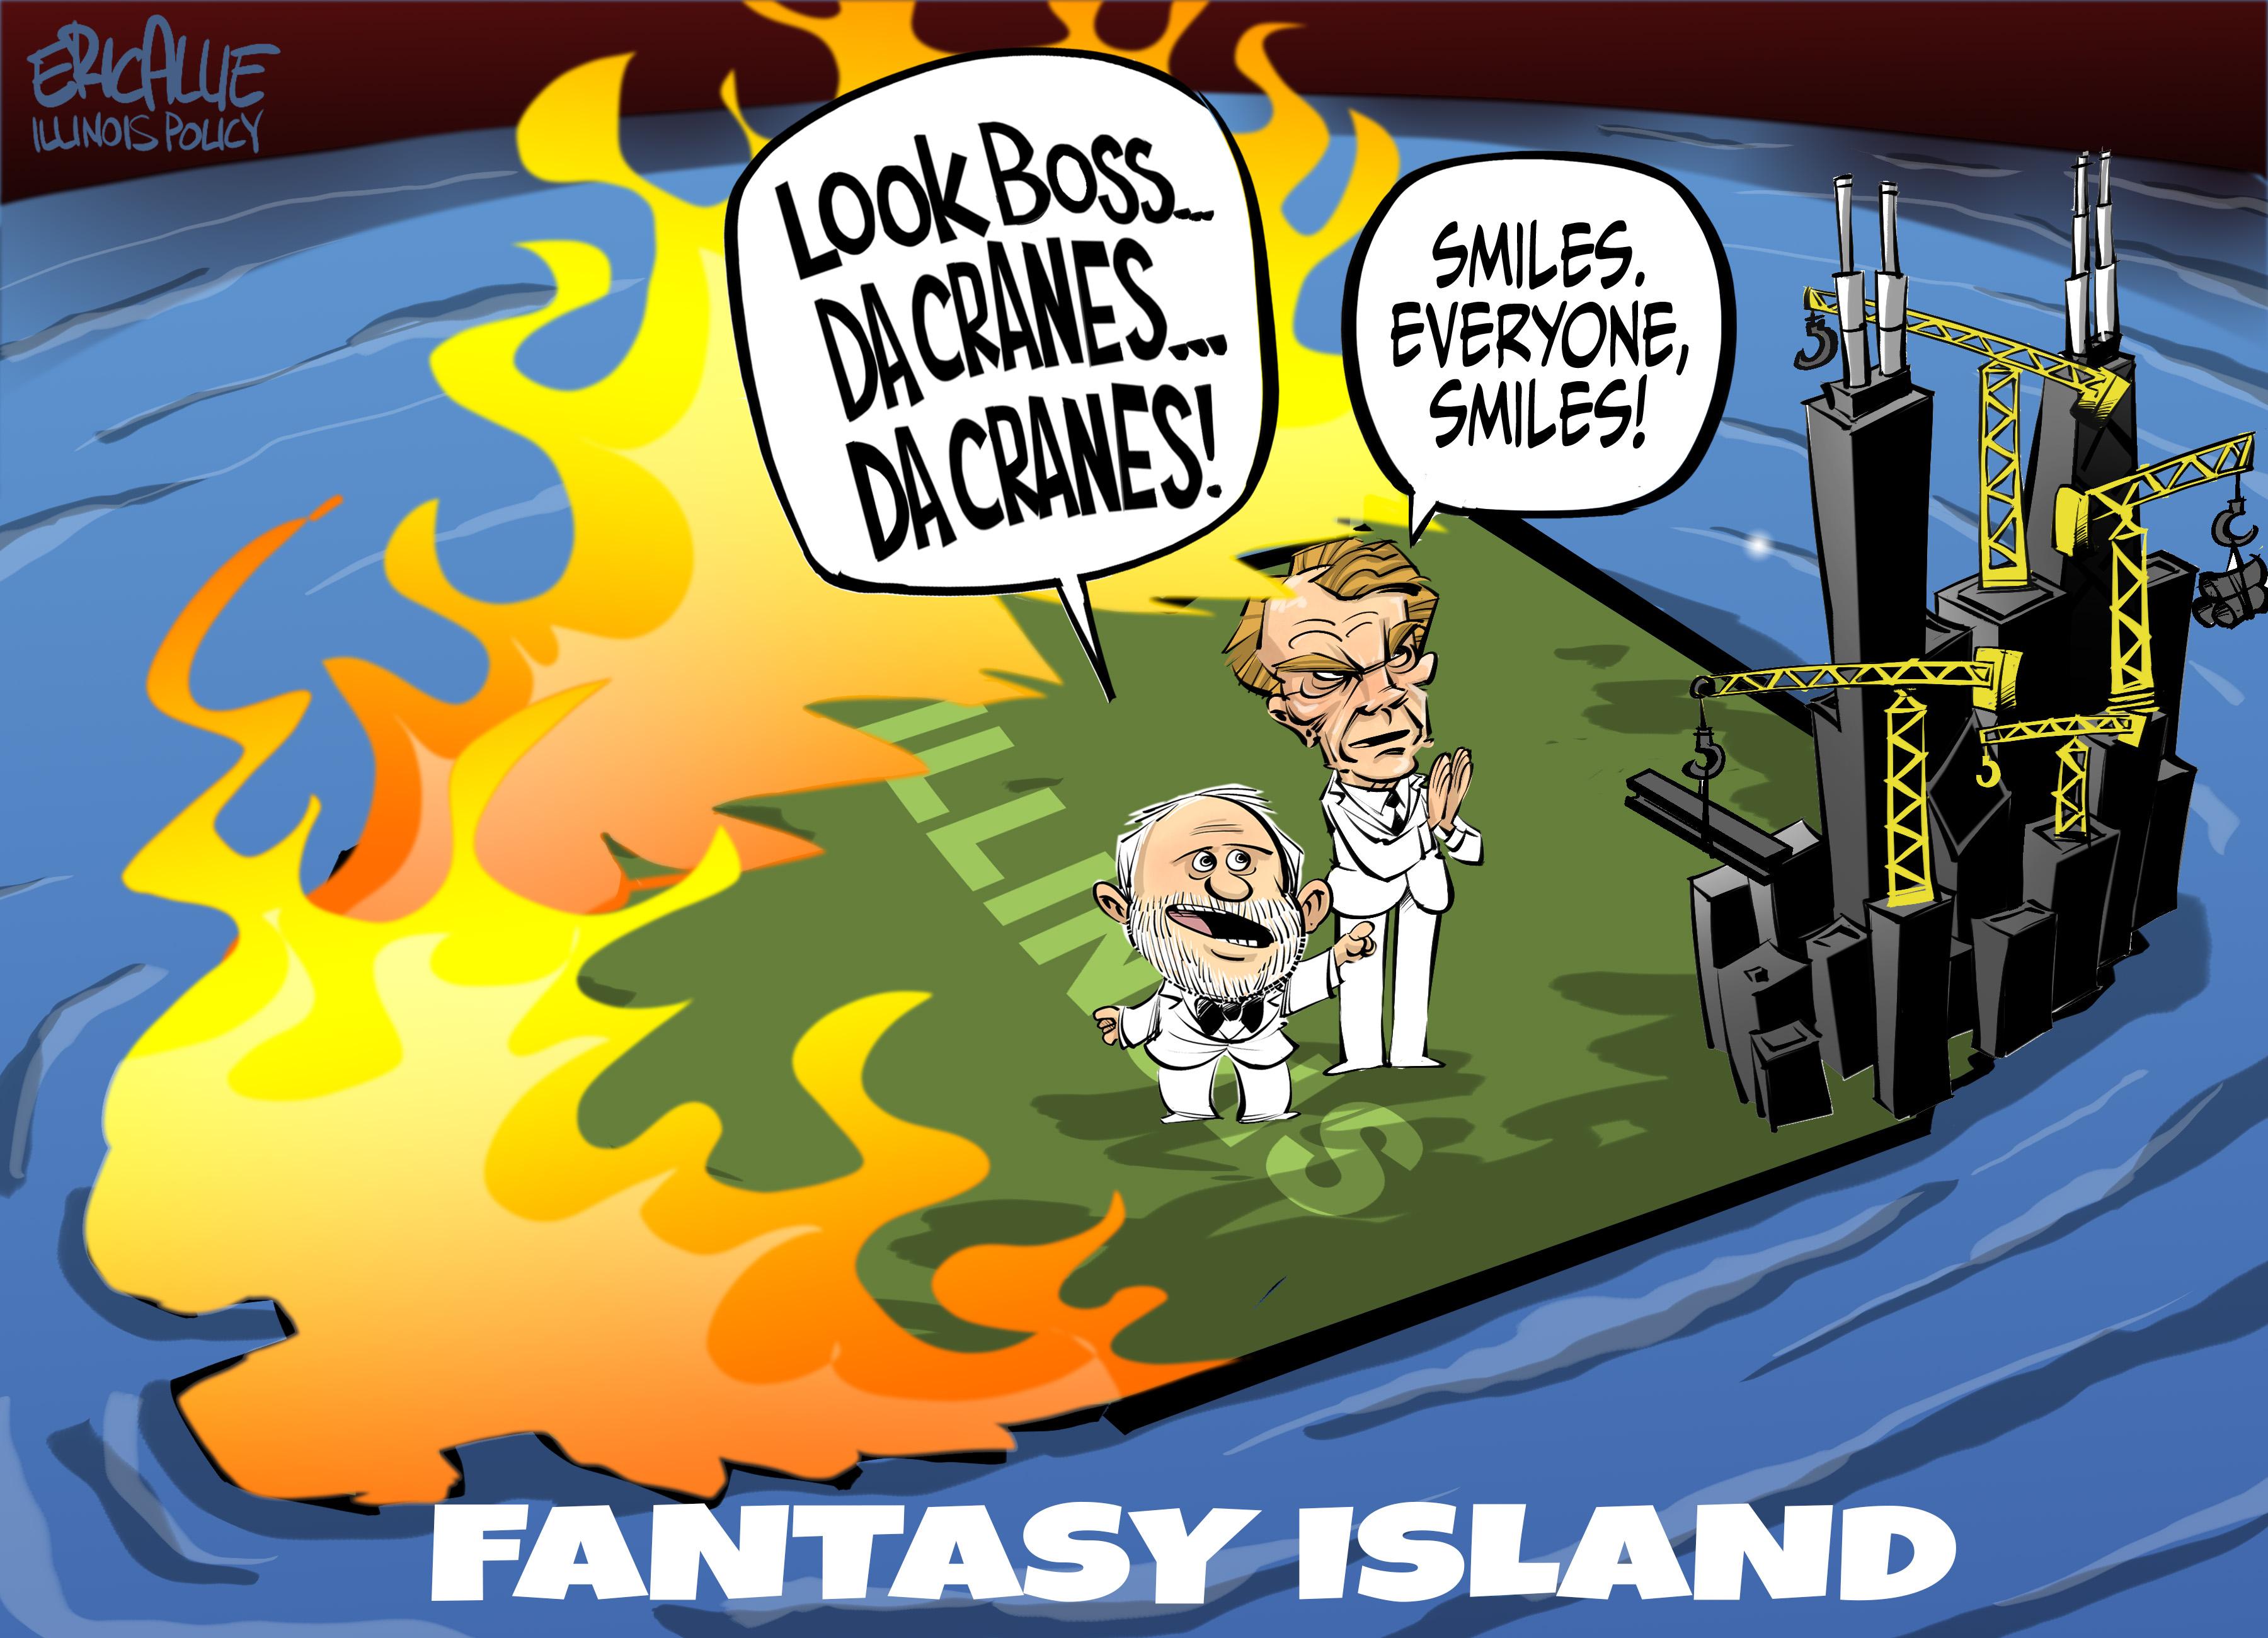 Madigan's Fantasy Island – Eric Allie Cartoon